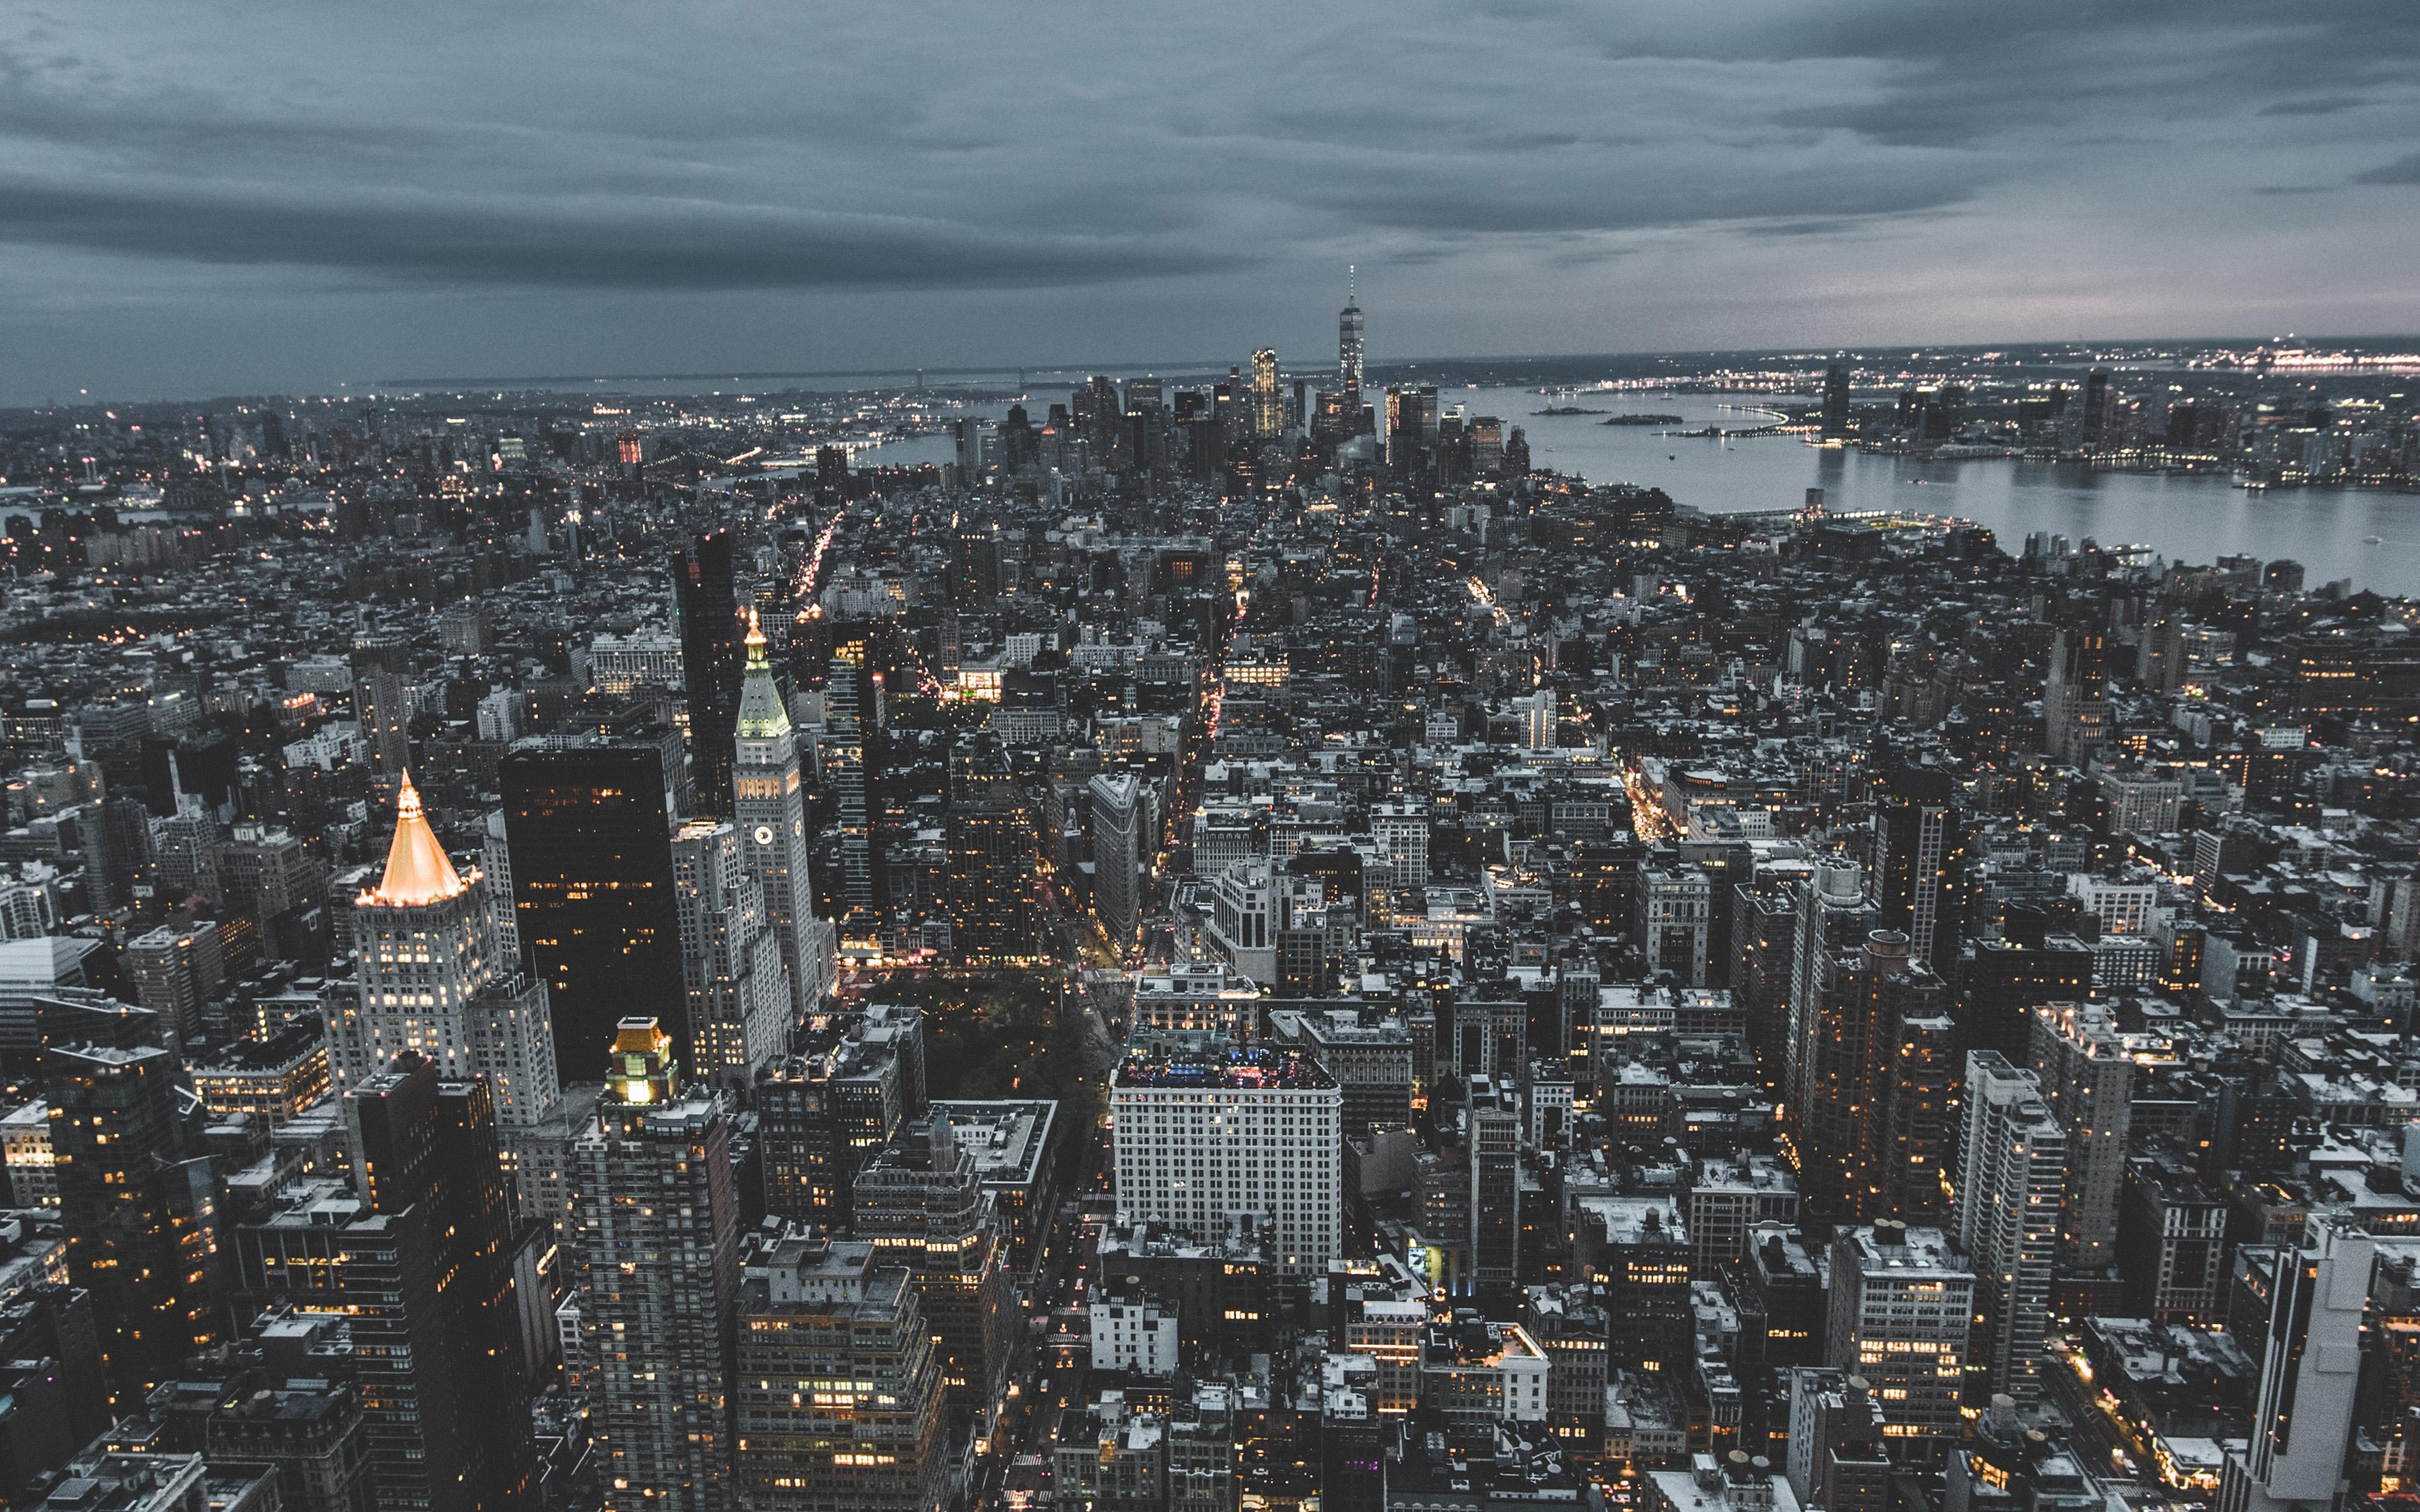 ns04-unsplash-city-sky-newyork-building-nature-wallpaper